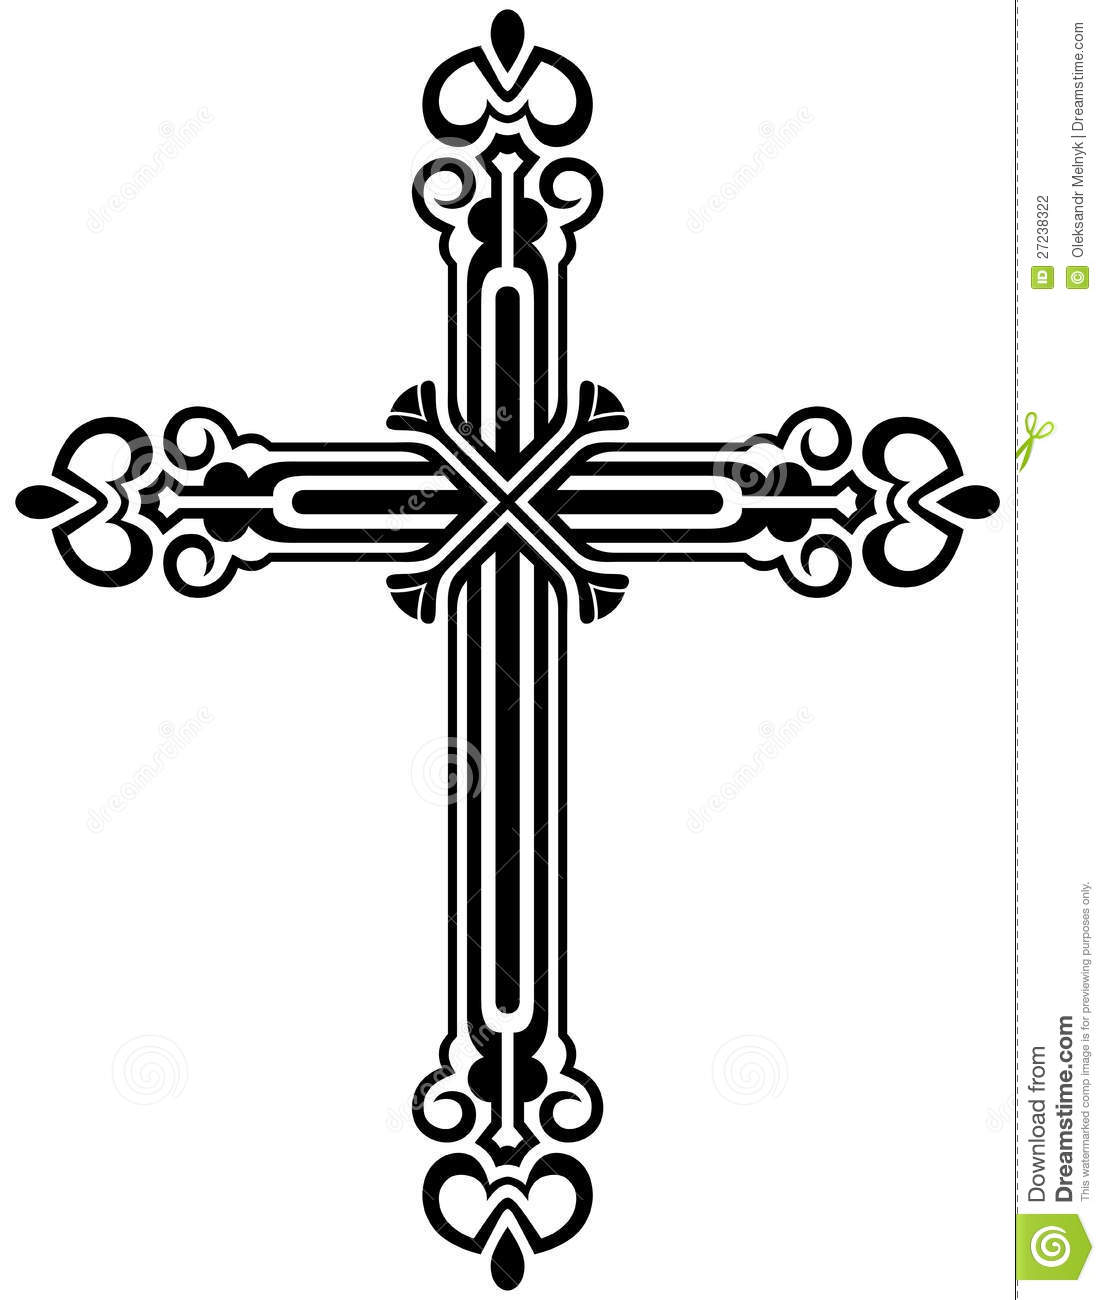 Religious Symbols Clipart Free Download Best Religious Symbols